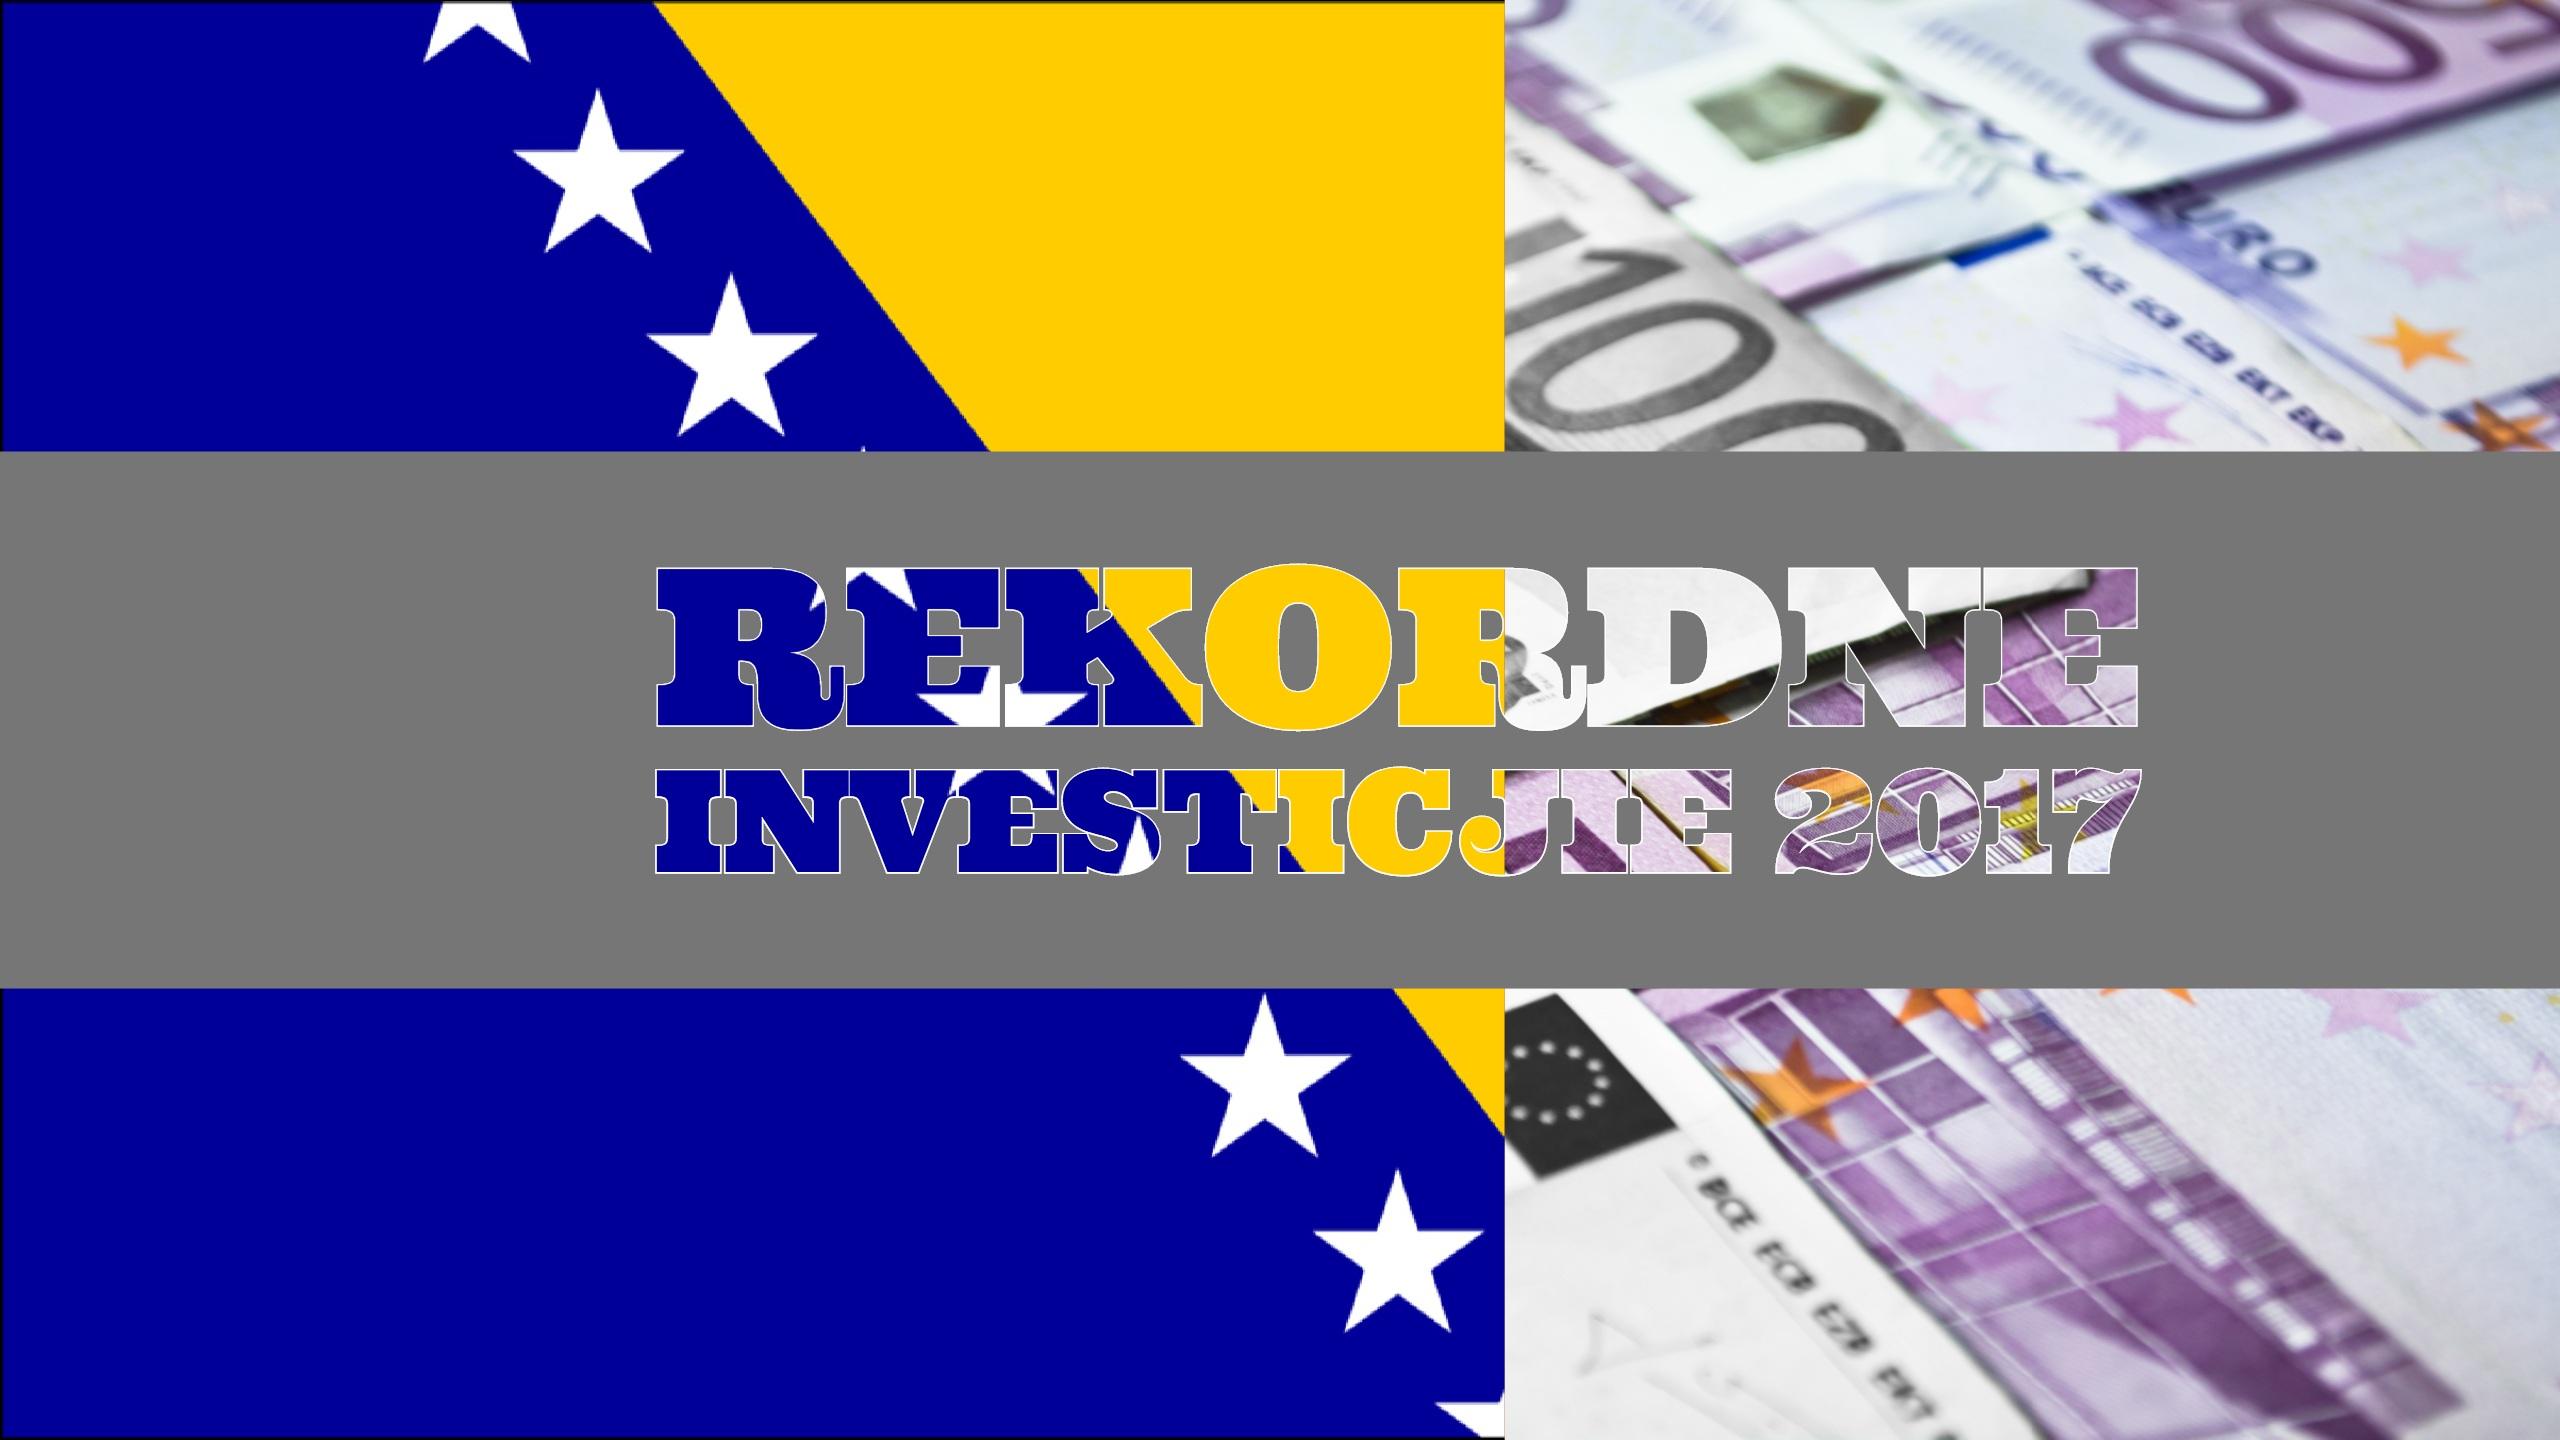 FIPA BiH: Rekordan iznos stranih investicija u 2017. godini